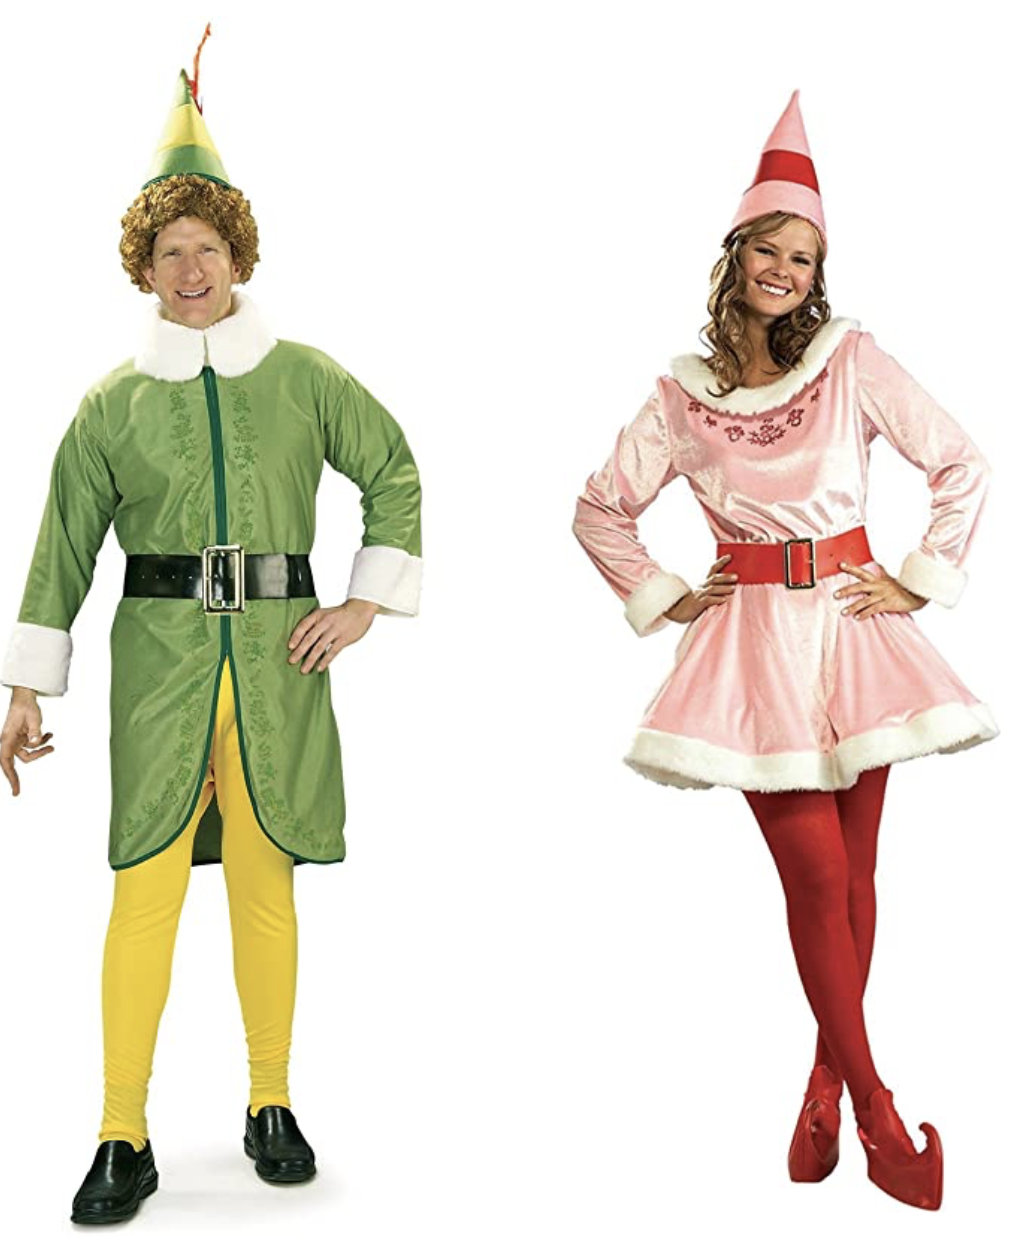 Buddy the Elf (STD) and Jovi Couples Costume Bundle Set